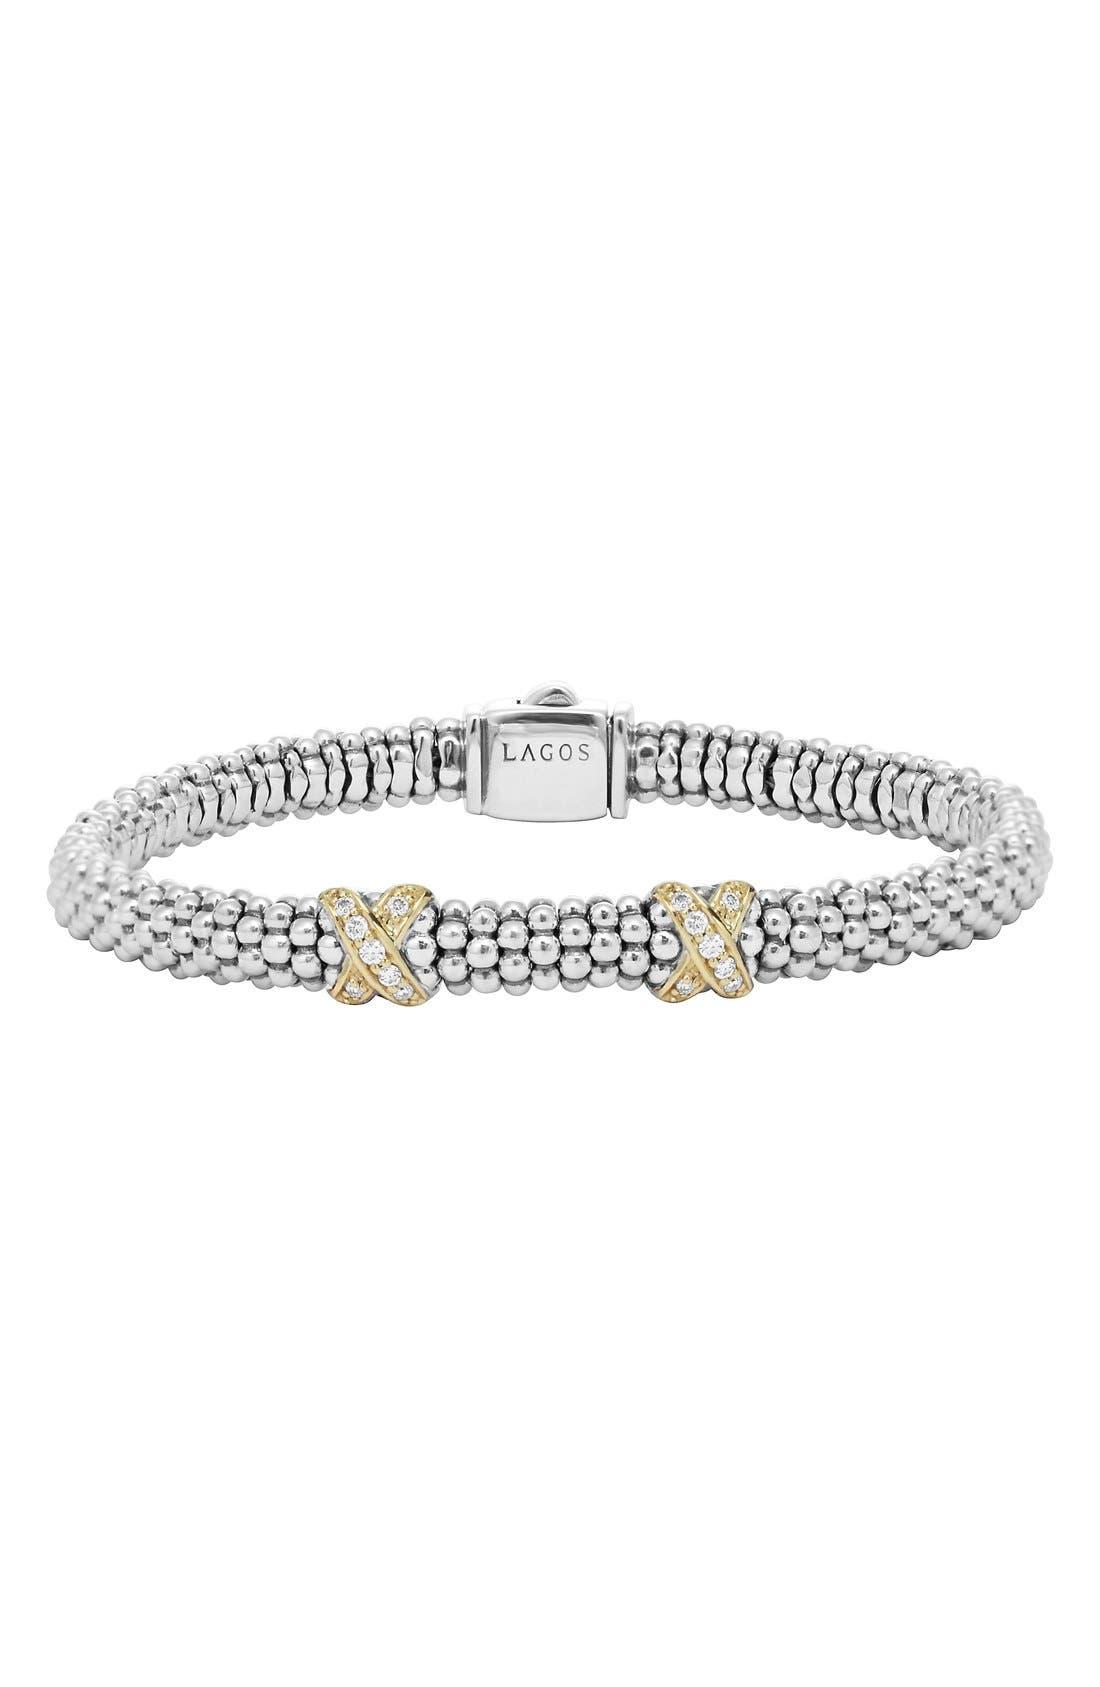 Lagos Diamond Lux 9mm Three Station Bracelet with Diamonds lH7gUwS4MD